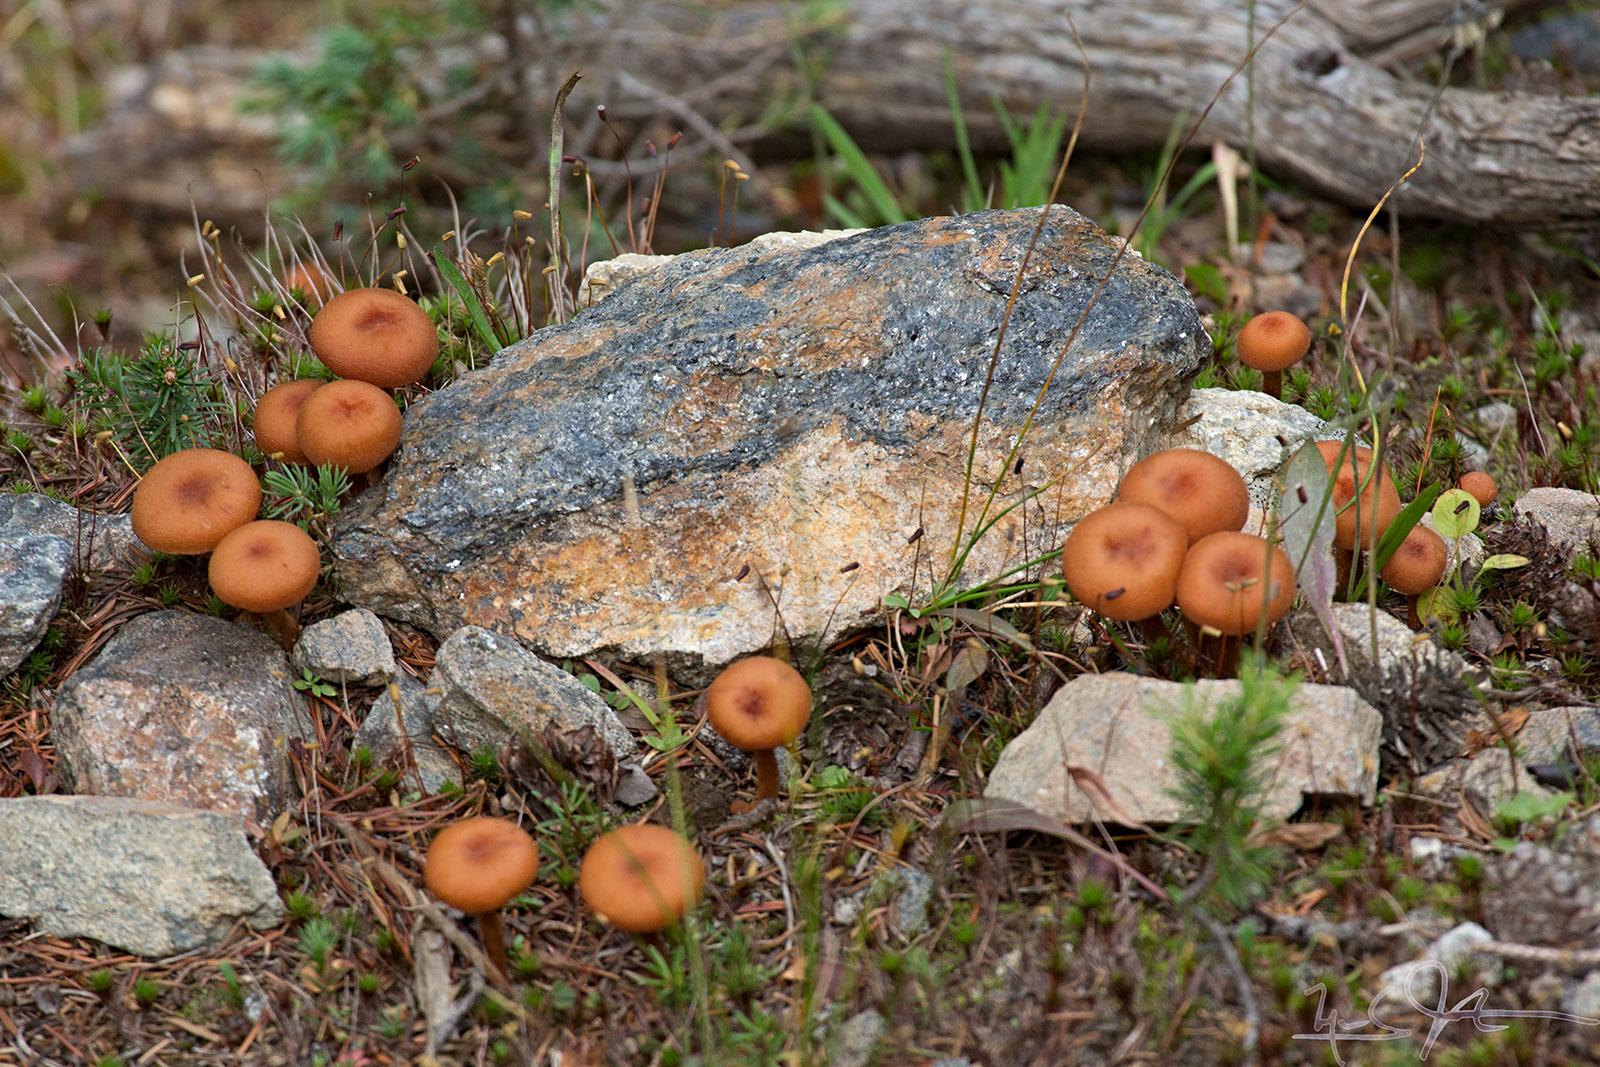 Many mushrooms burst forth.